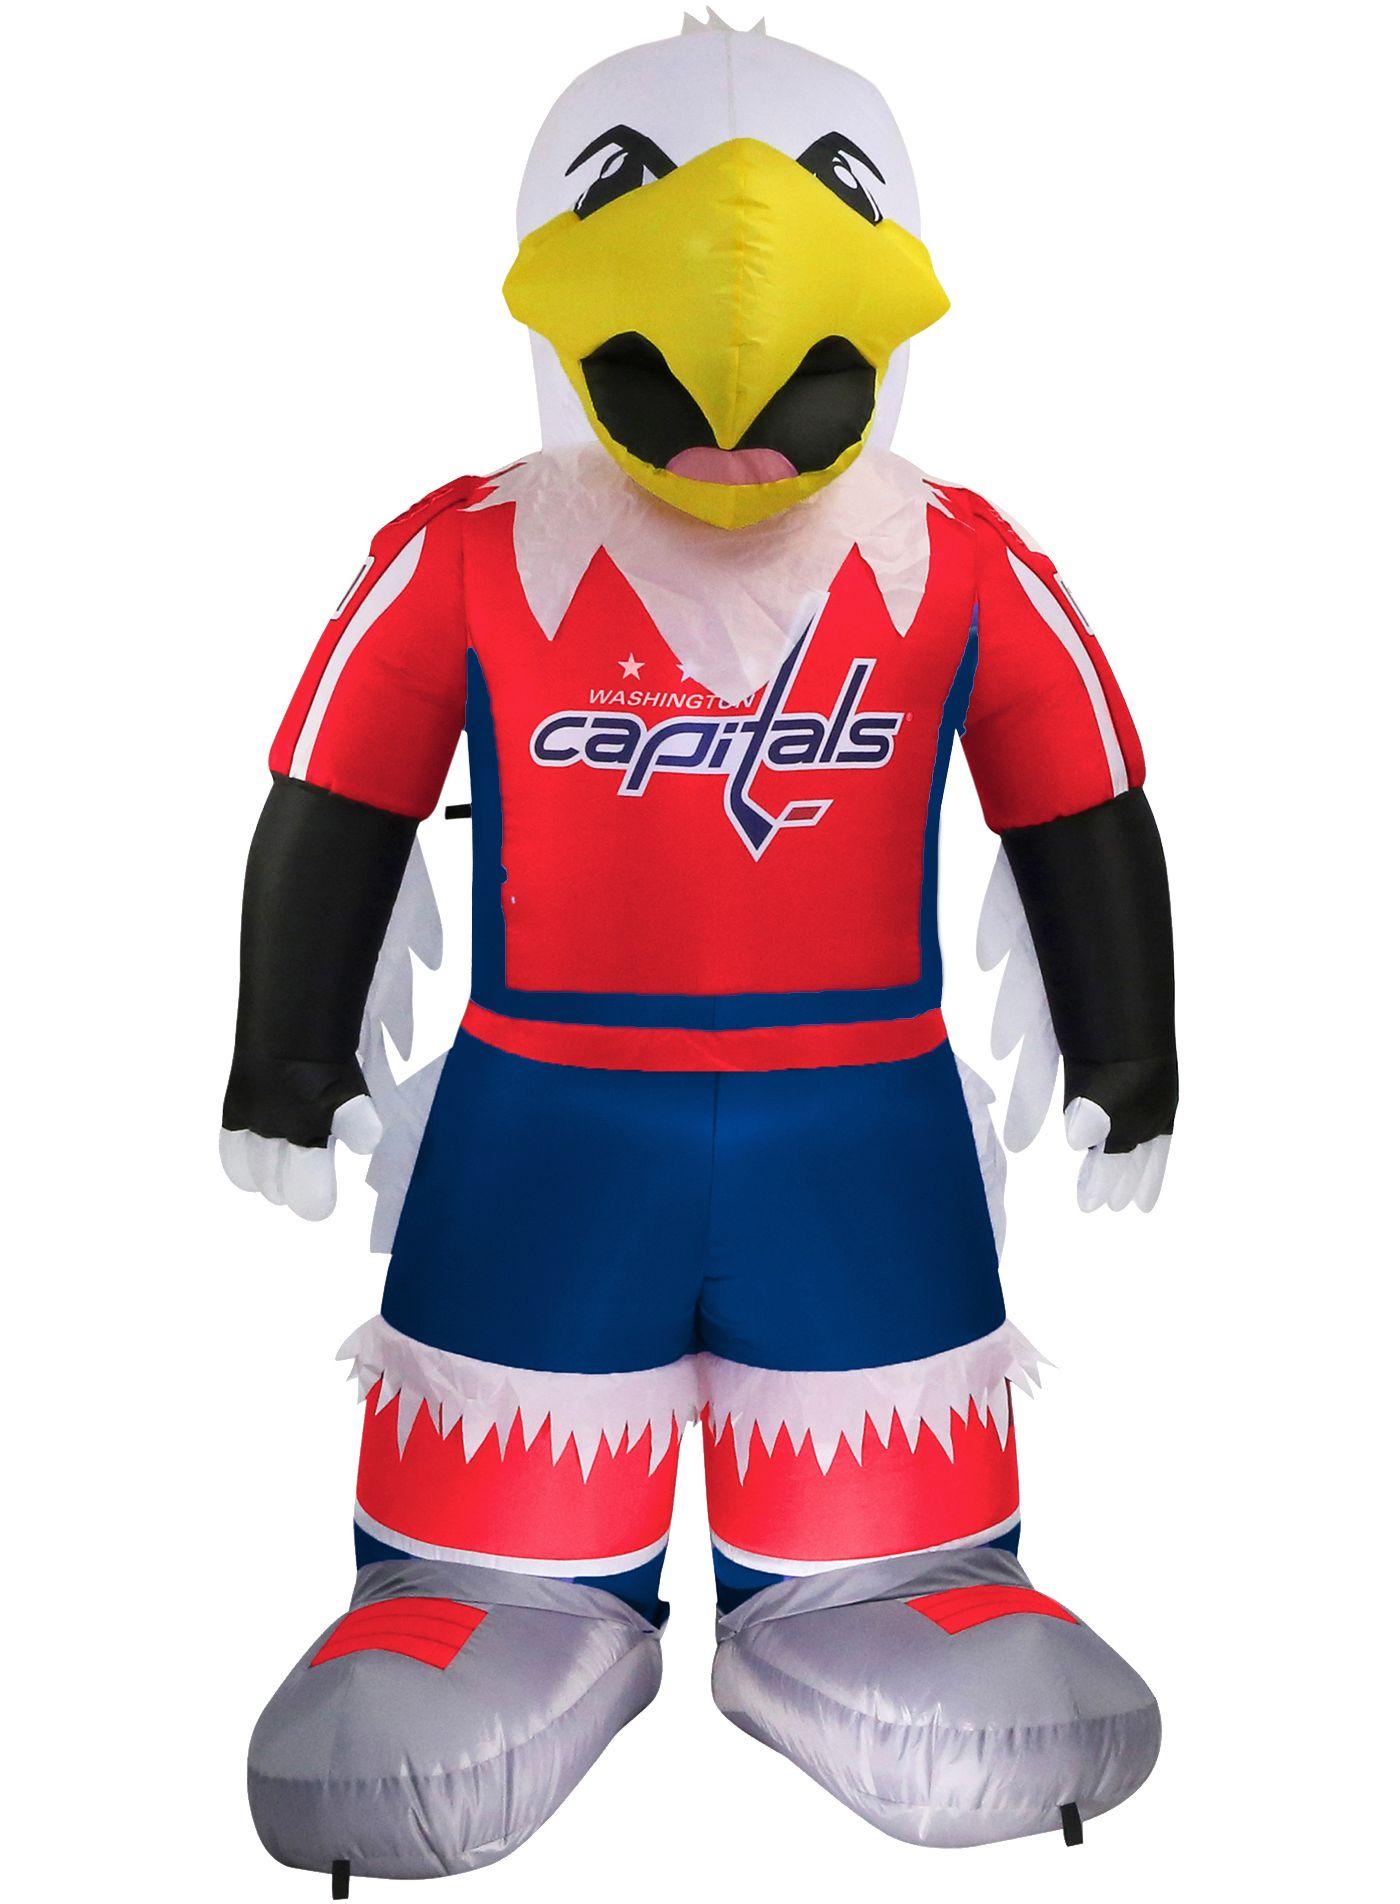 Boelter Washington Capitals Inflatable Mascot